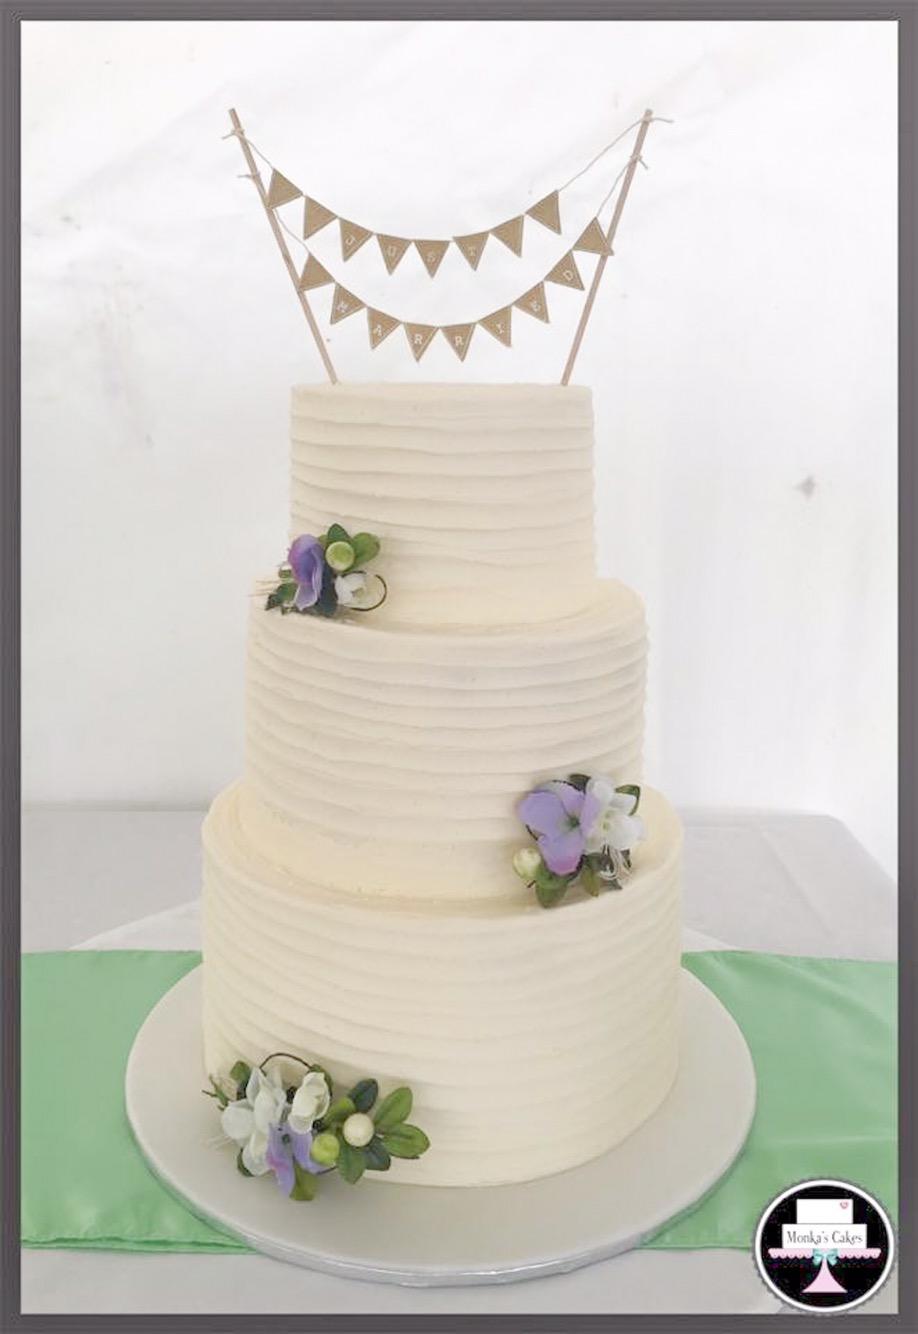 Wedding Cakes /Desserts / Bonbonnieres – Monka\'s Cakes